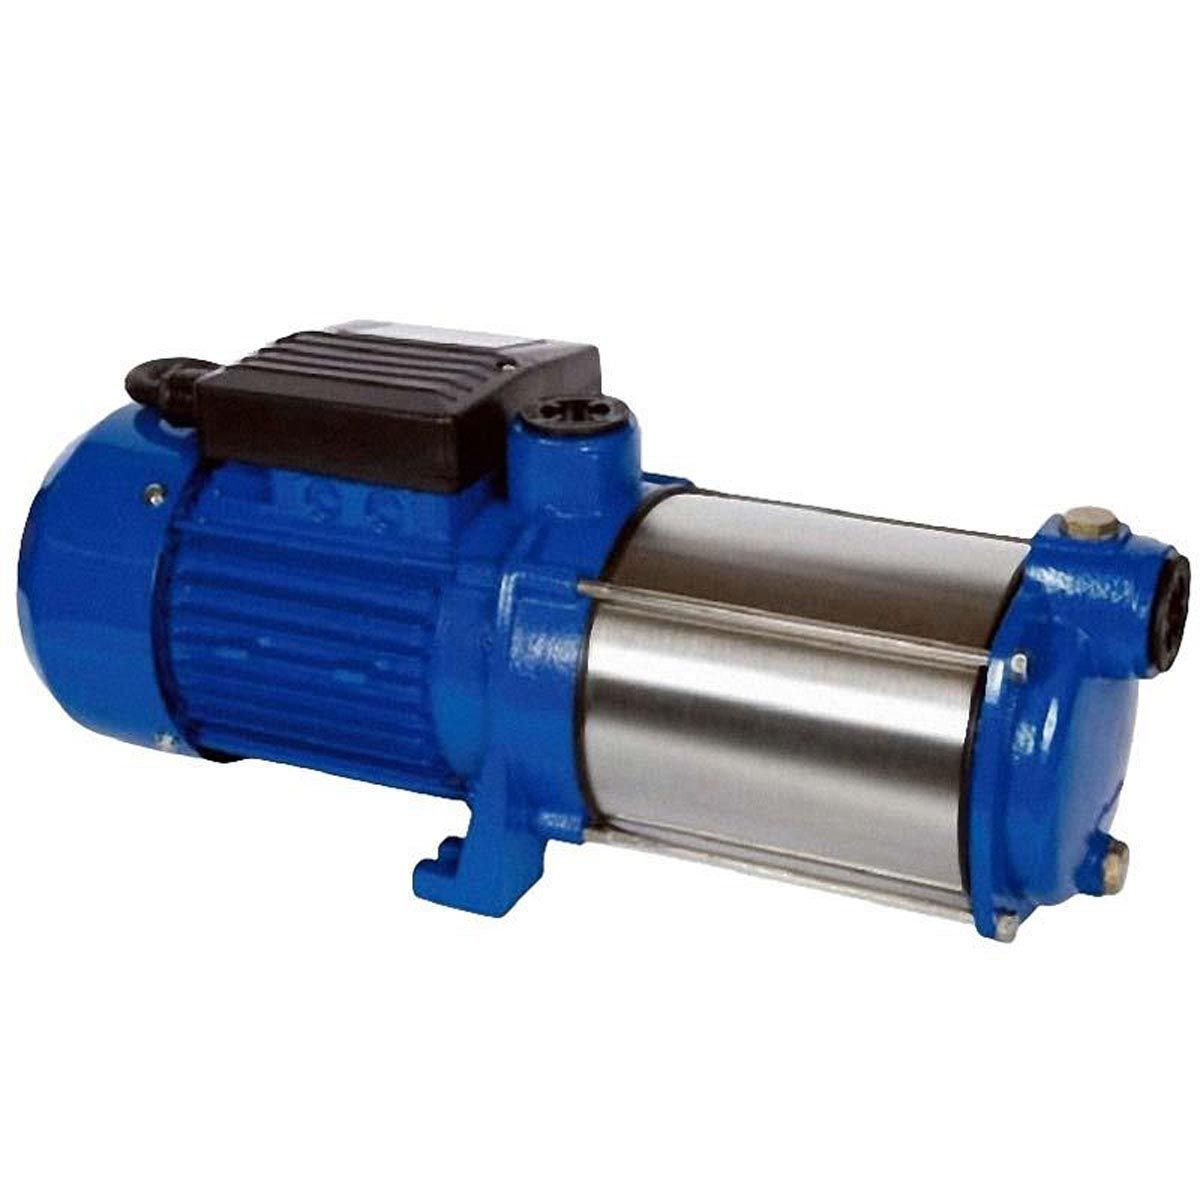 Spülpumpe M80, zu Aquaforte Trommelfilter, 4.8 m³/h, 3.4 bar, 550W, 1' IG